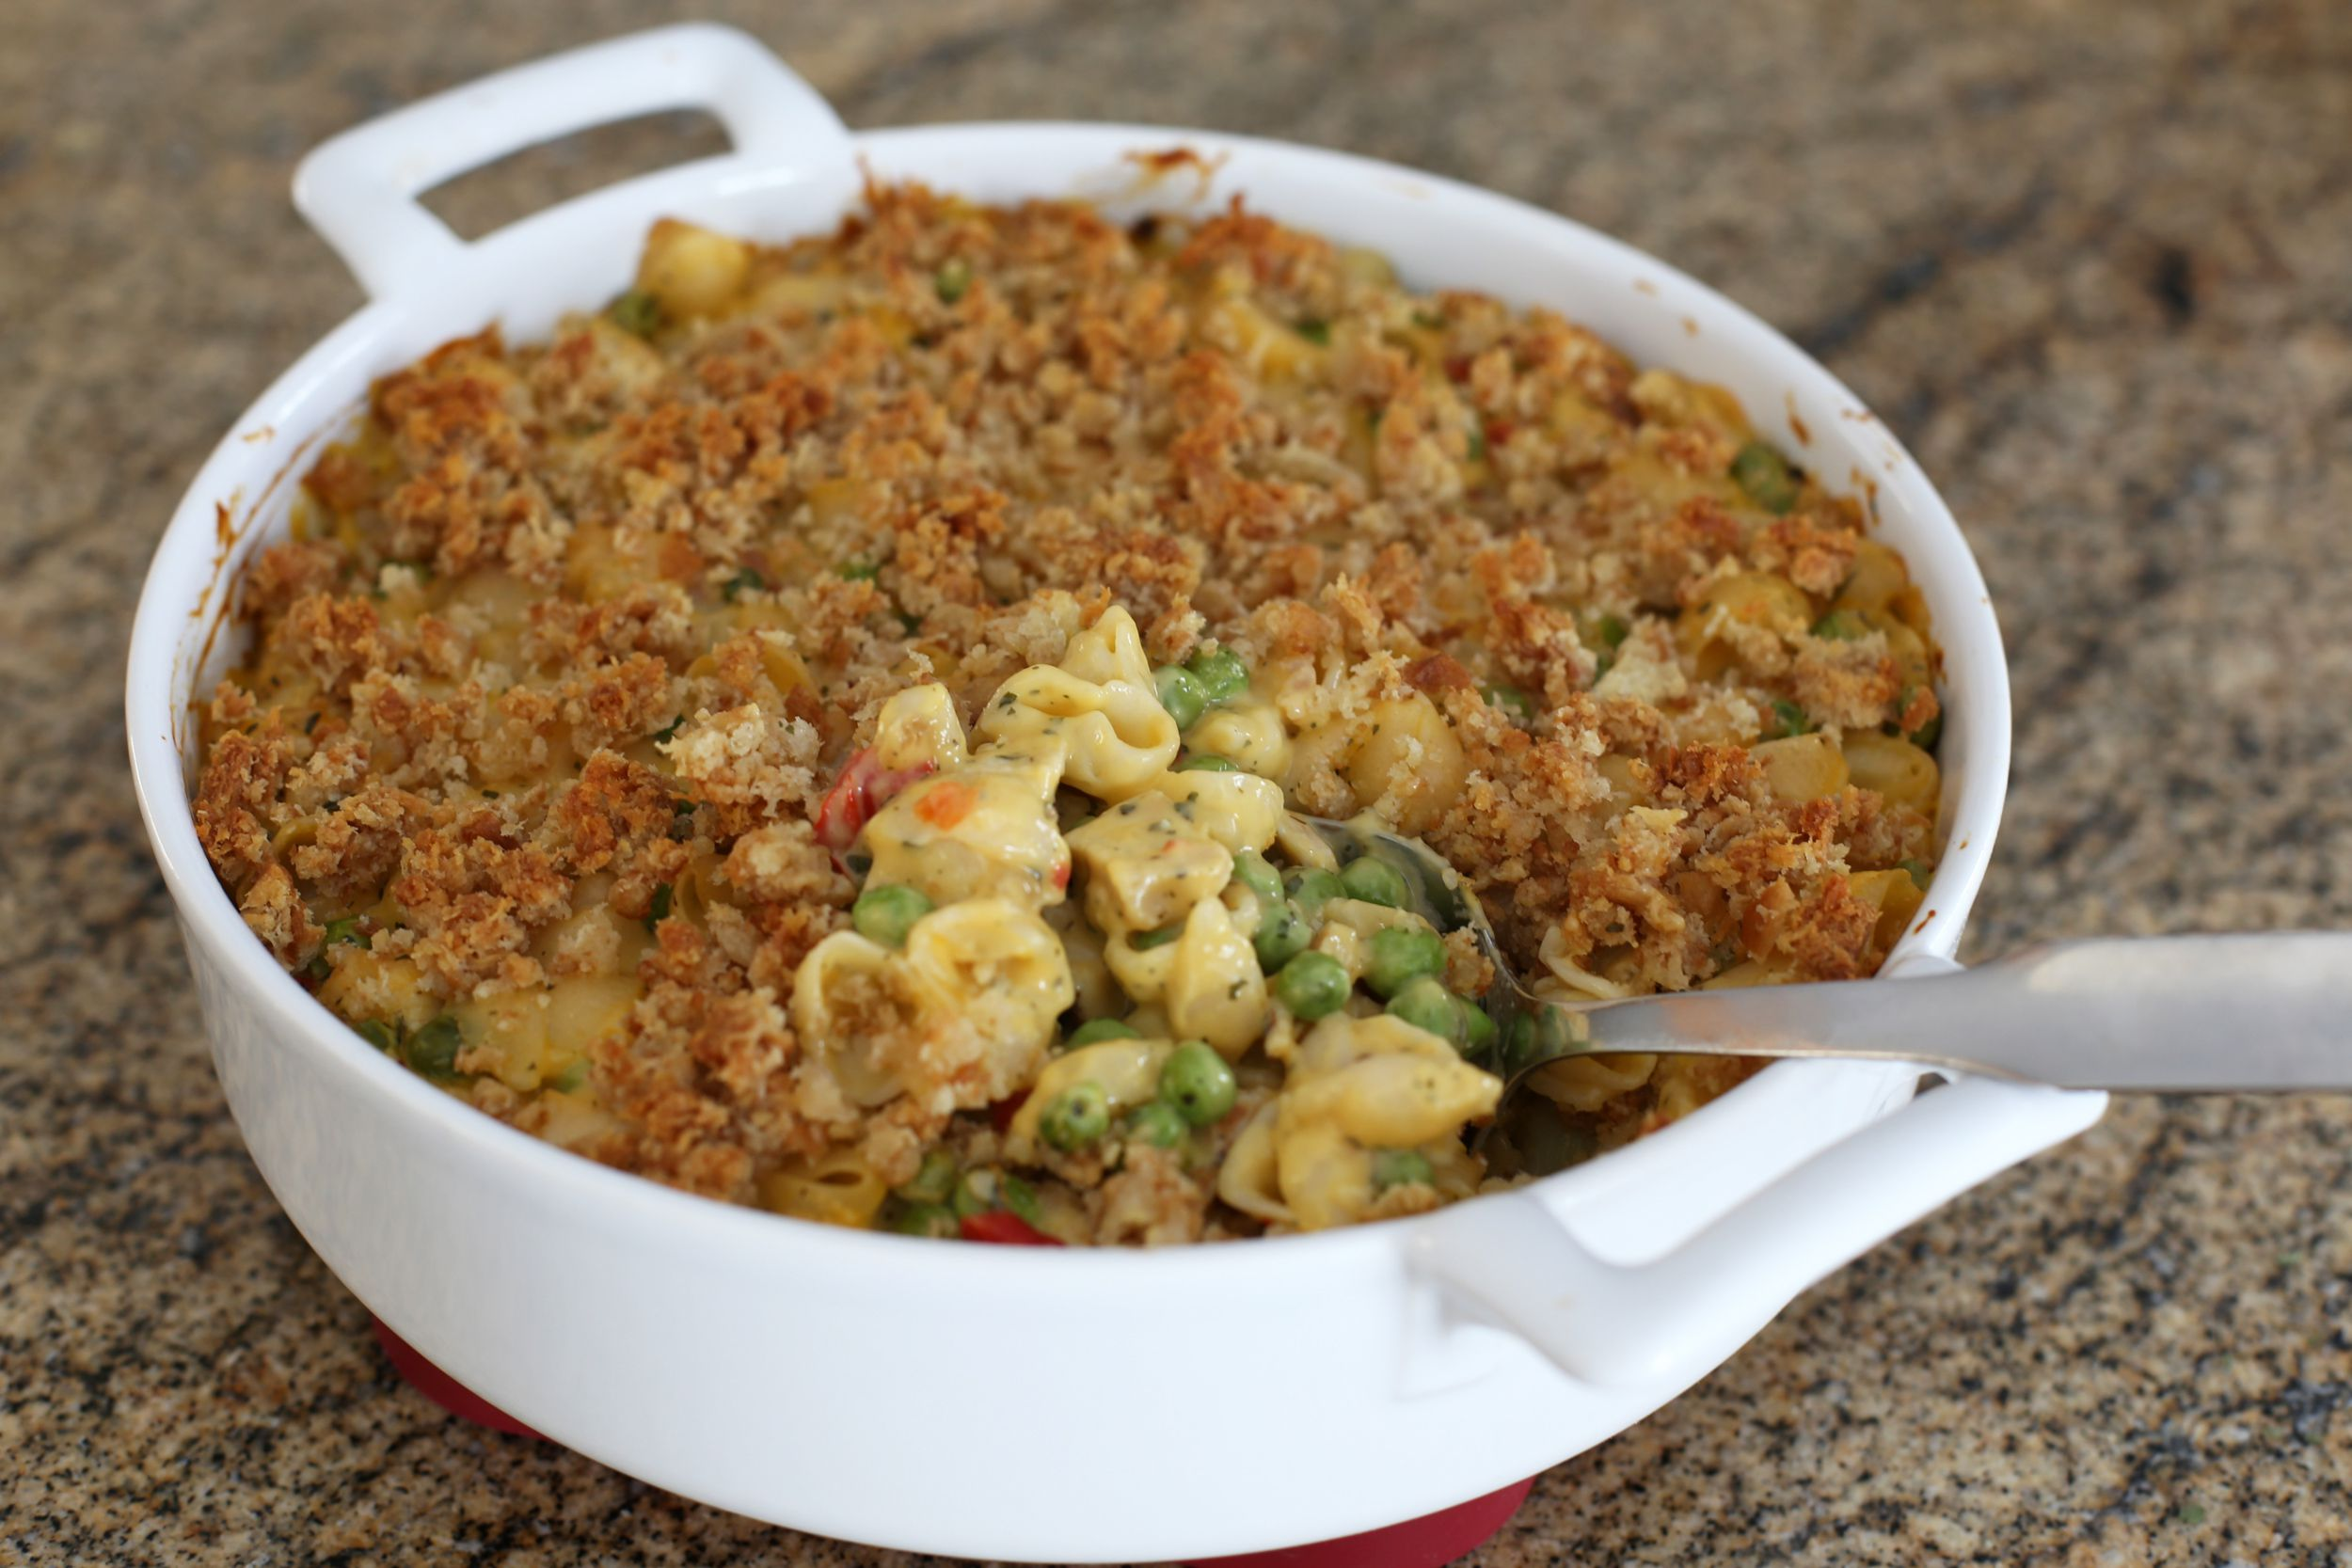 Easy Chicken Macaroni And Cheese Casserole Recipe